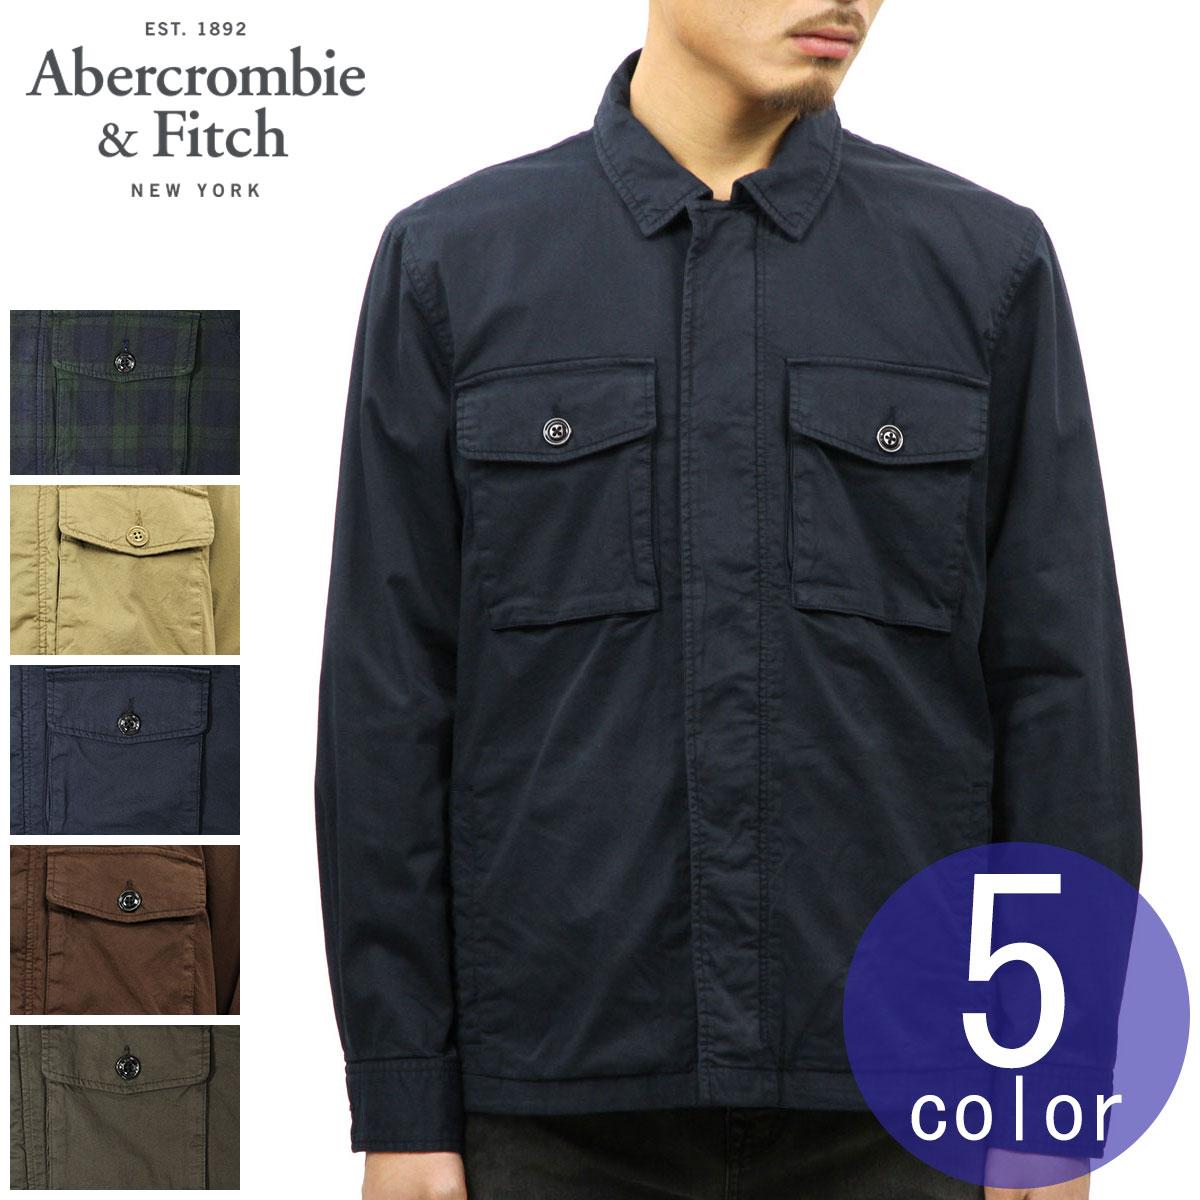 bce3c2183 ABBA black shirt men's regular article Abercrombie & Fitch long sleeves  shirt jacket ZIP-UP SHIRT JACKET